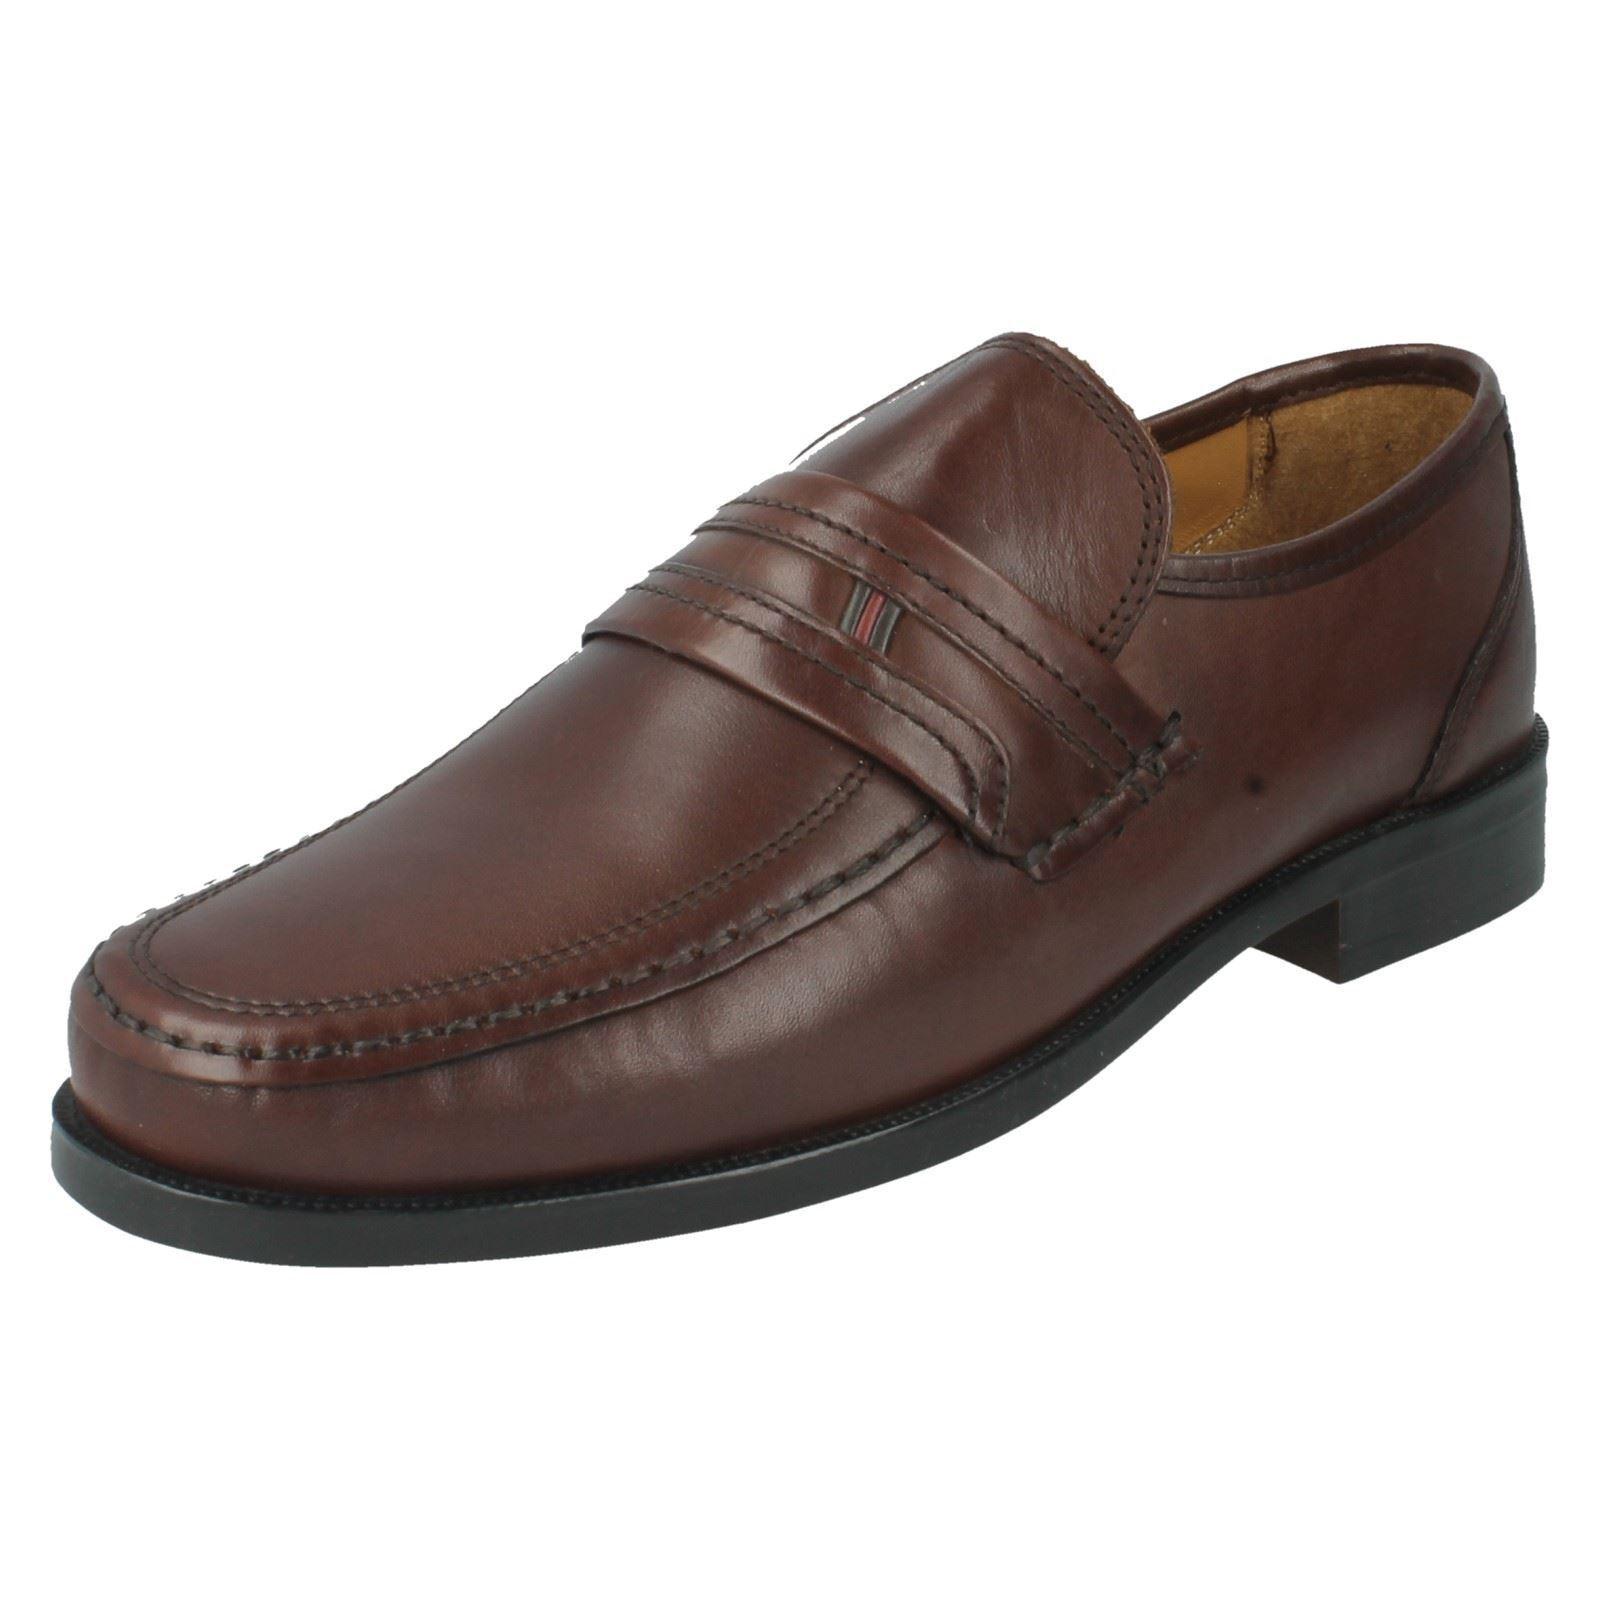 SALE  BEZEL Herren CLARKS BEZEL  EDGE WIDE LEATHER SMART SLIP ON LOAFER Schuhe 252450